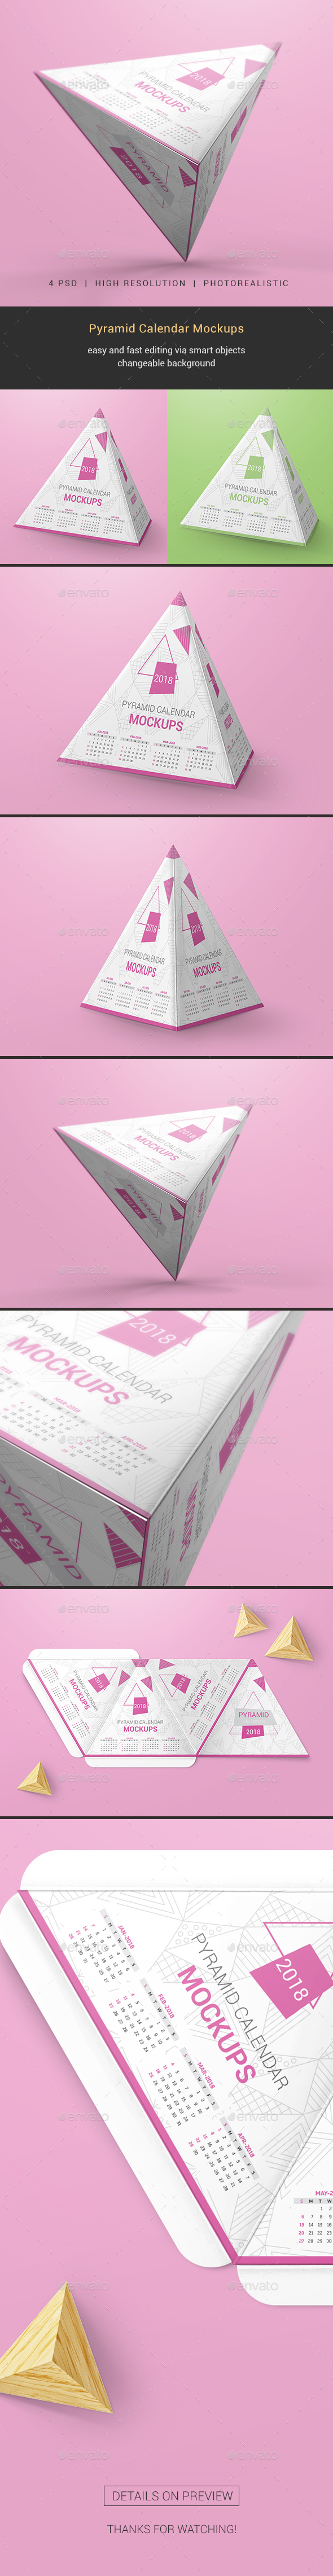 Pyramid Calendar Mockups - Miscellaneous Print